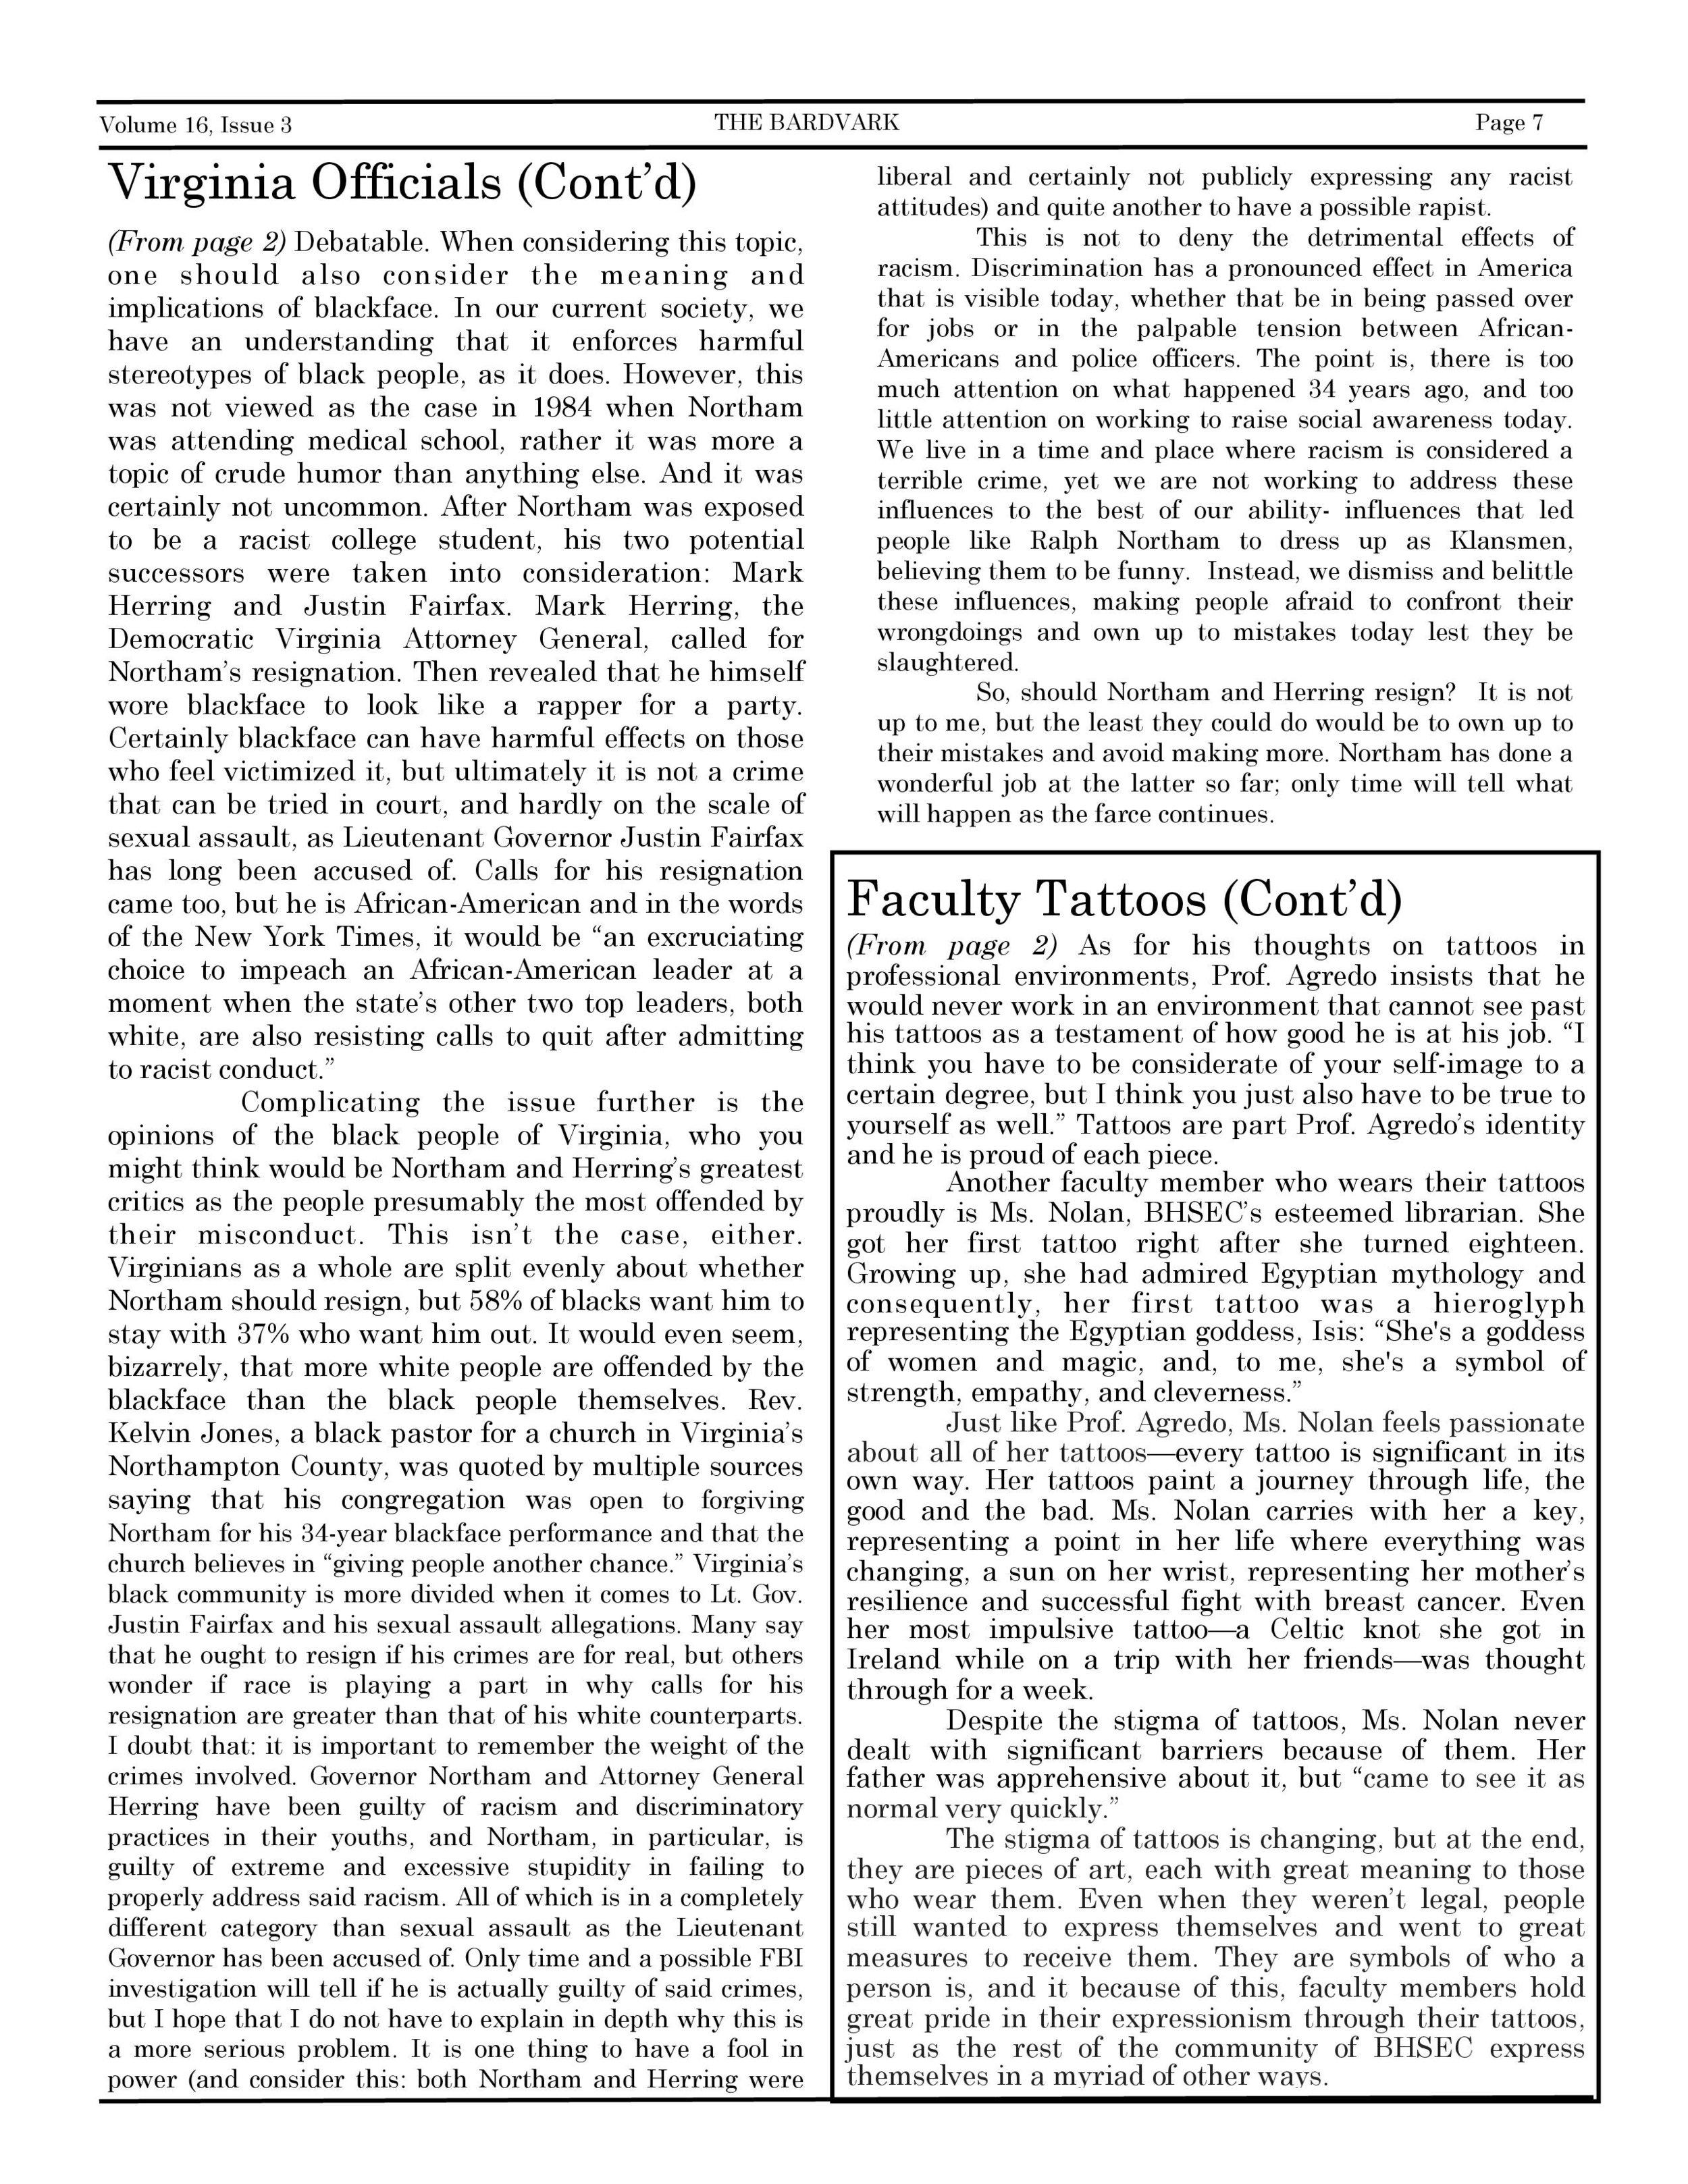 Issue 6 February 2019-7.jpg